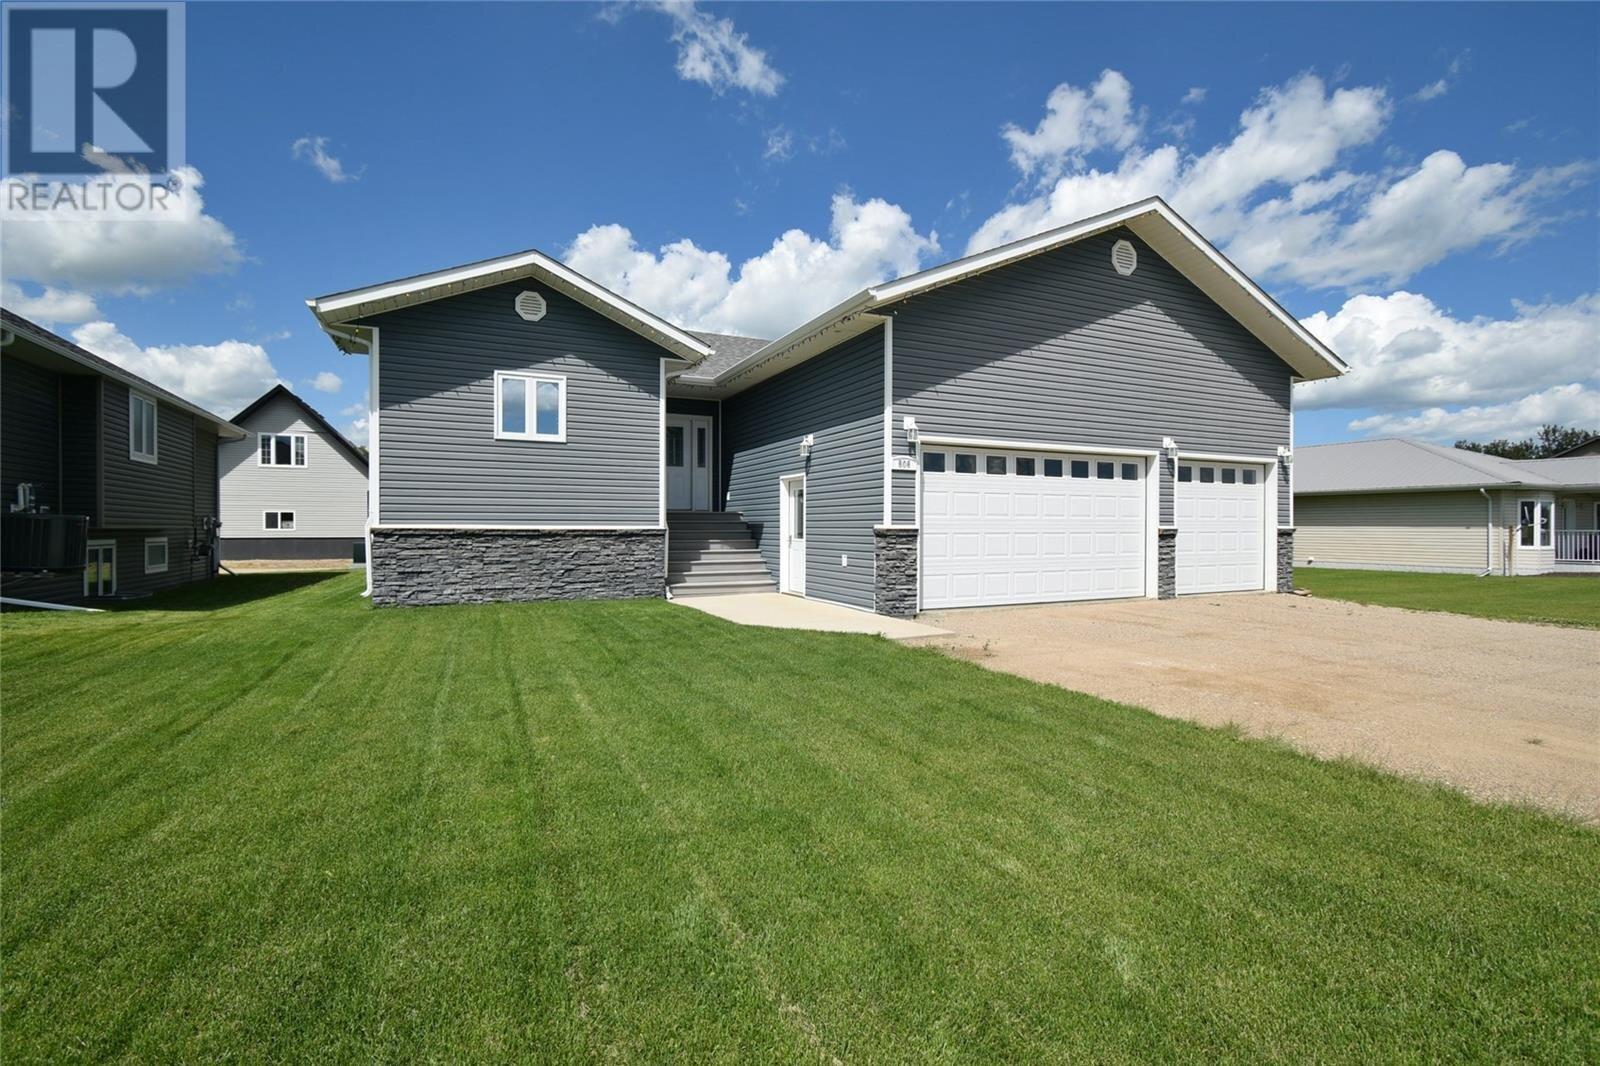 House for sale at 506 Wright Rd Moosomin Saskatchewan - MLS: SK818400